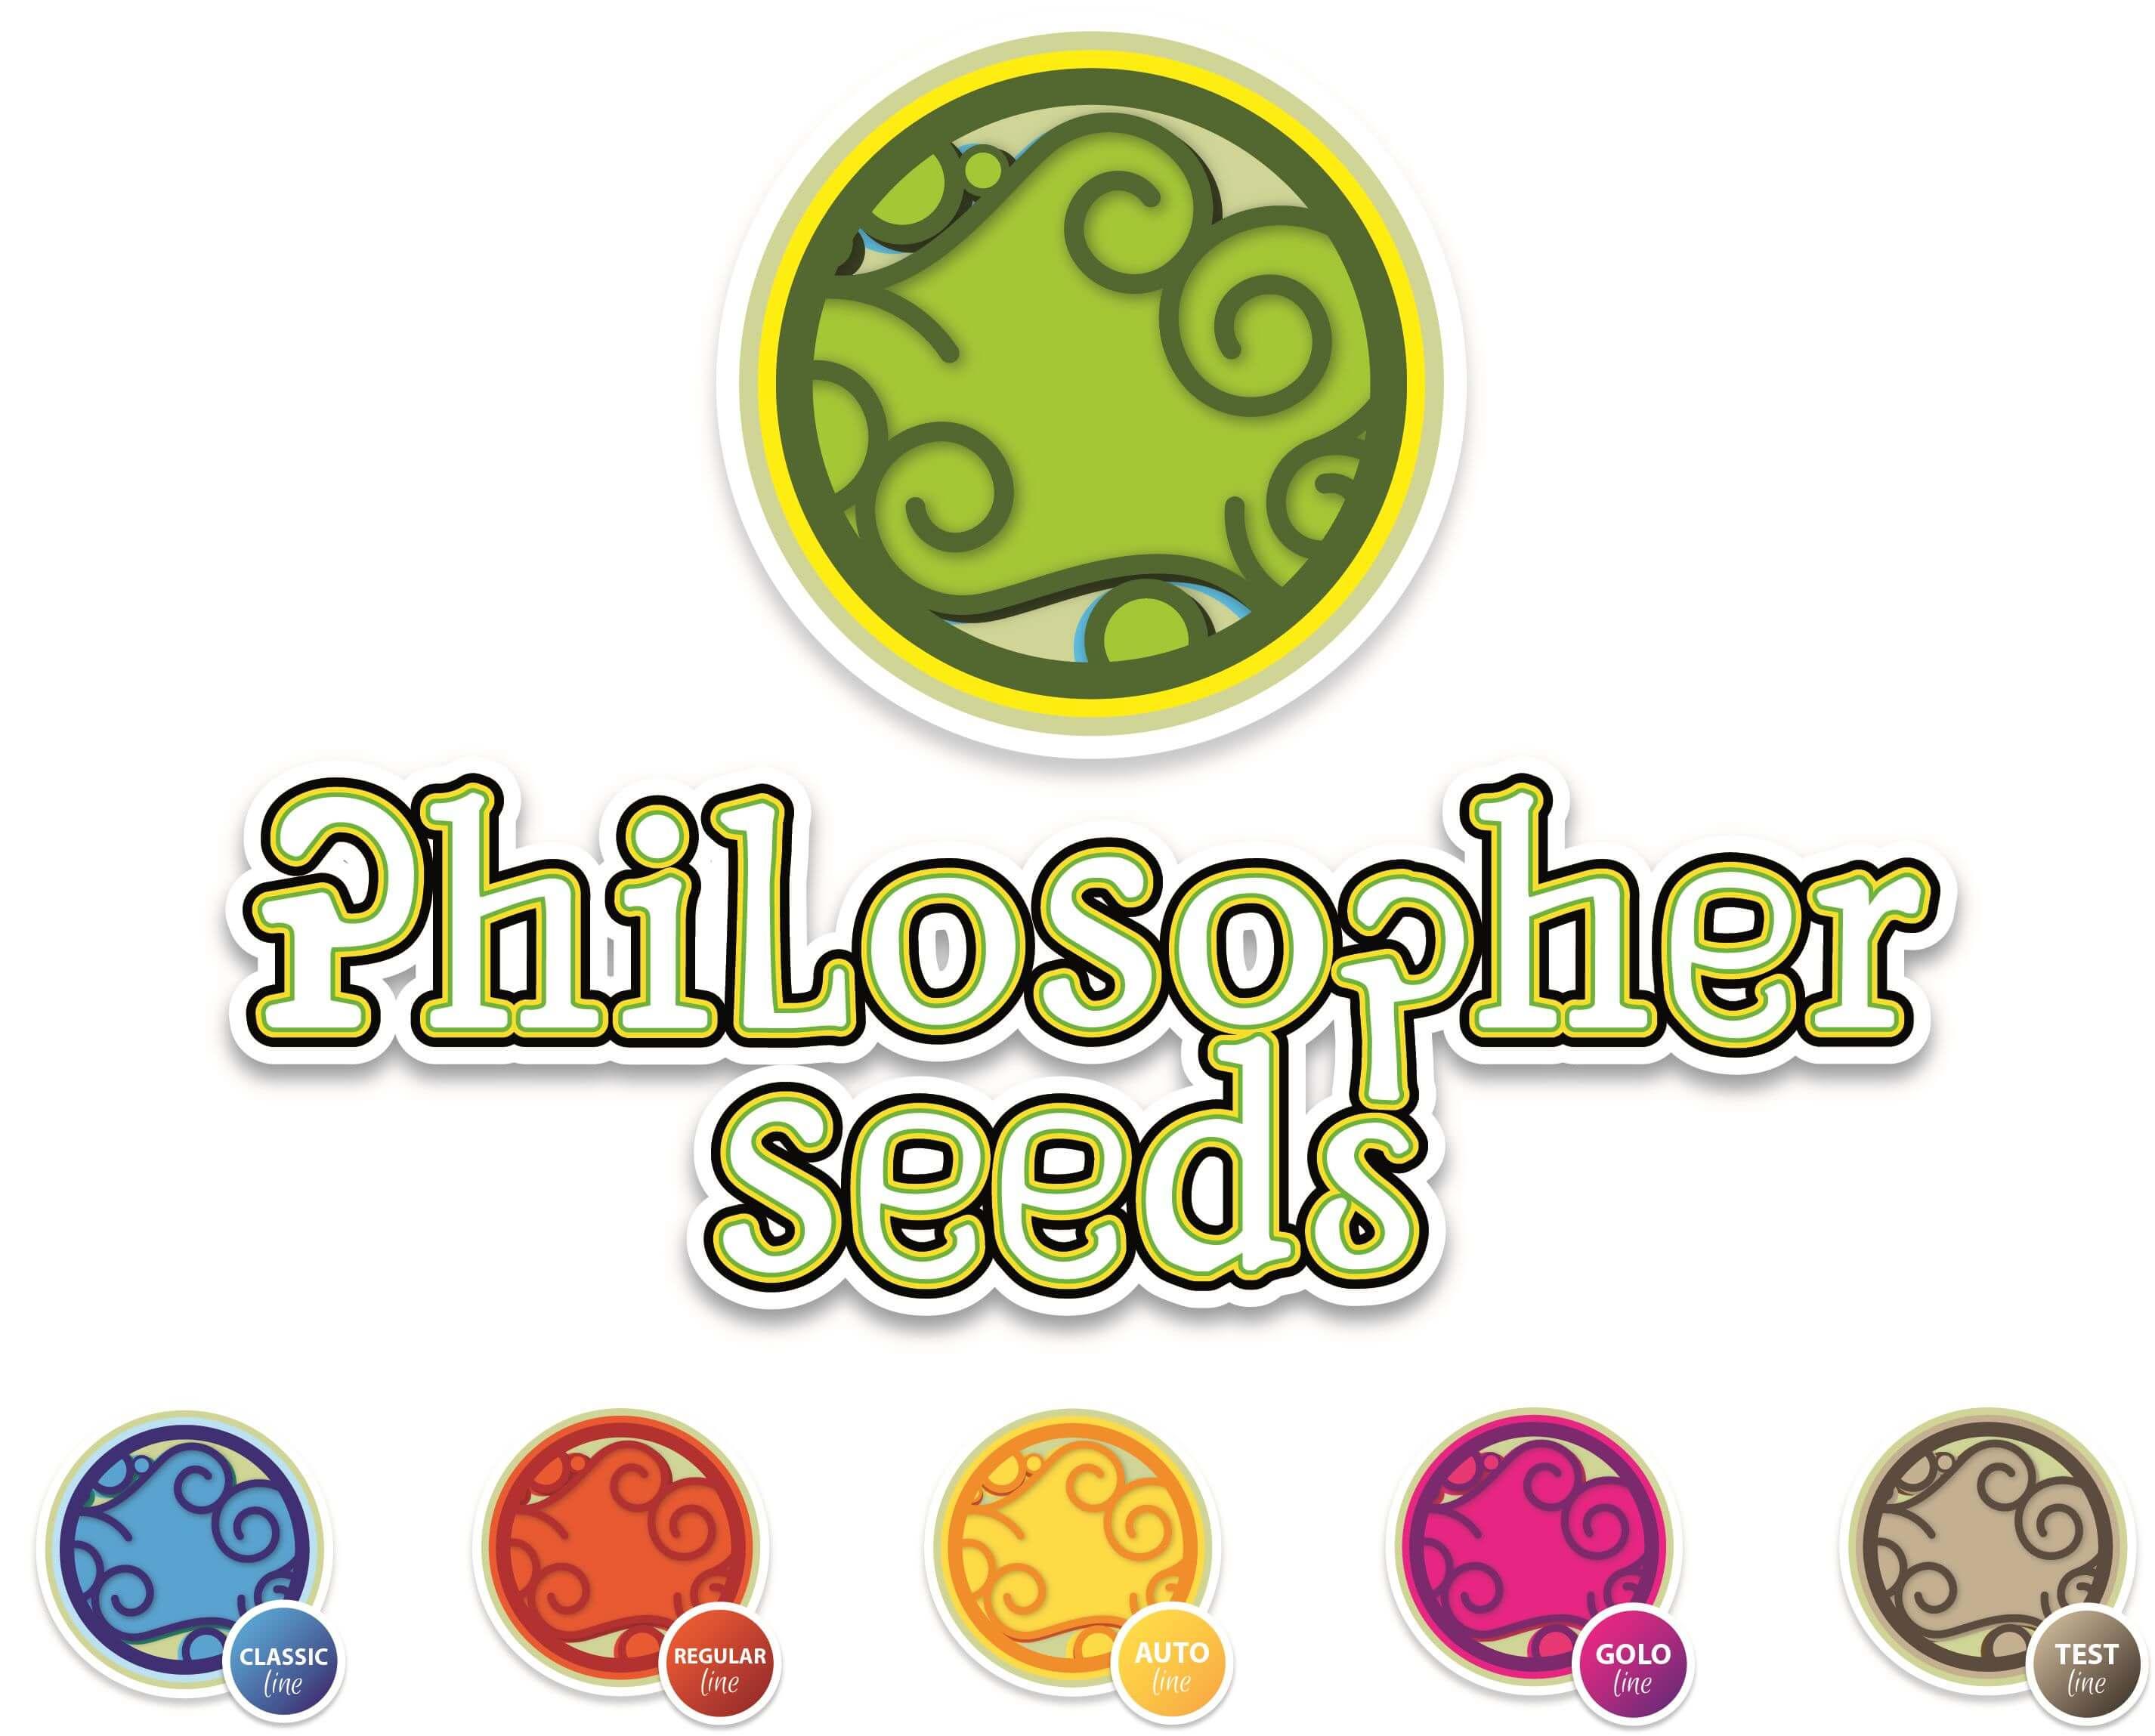 Philosopher Seeds, apasionados por la marihuana